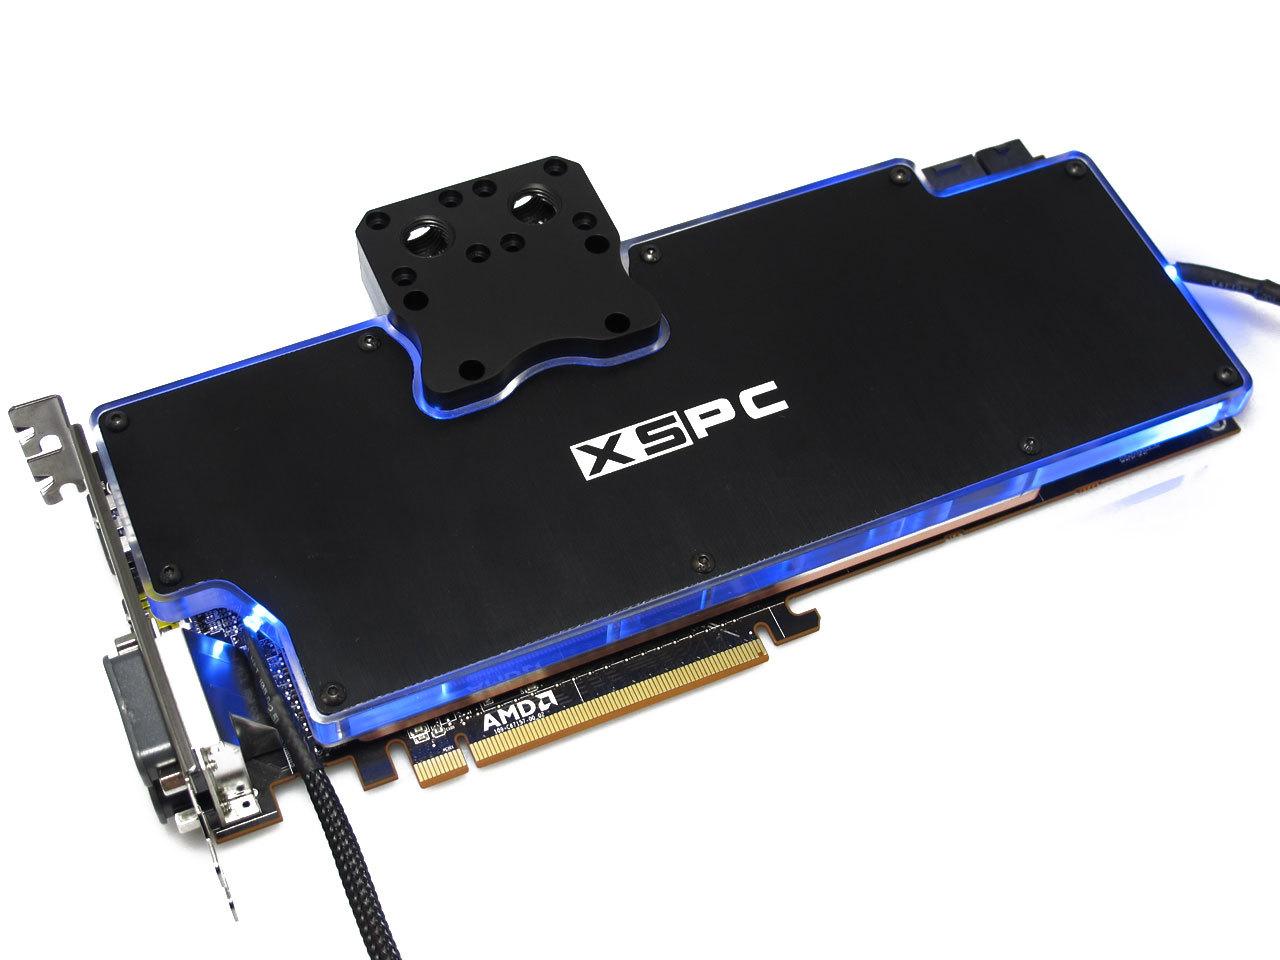 Razor R9 290X / 290 — XSPC - Performance PC Water Cooling